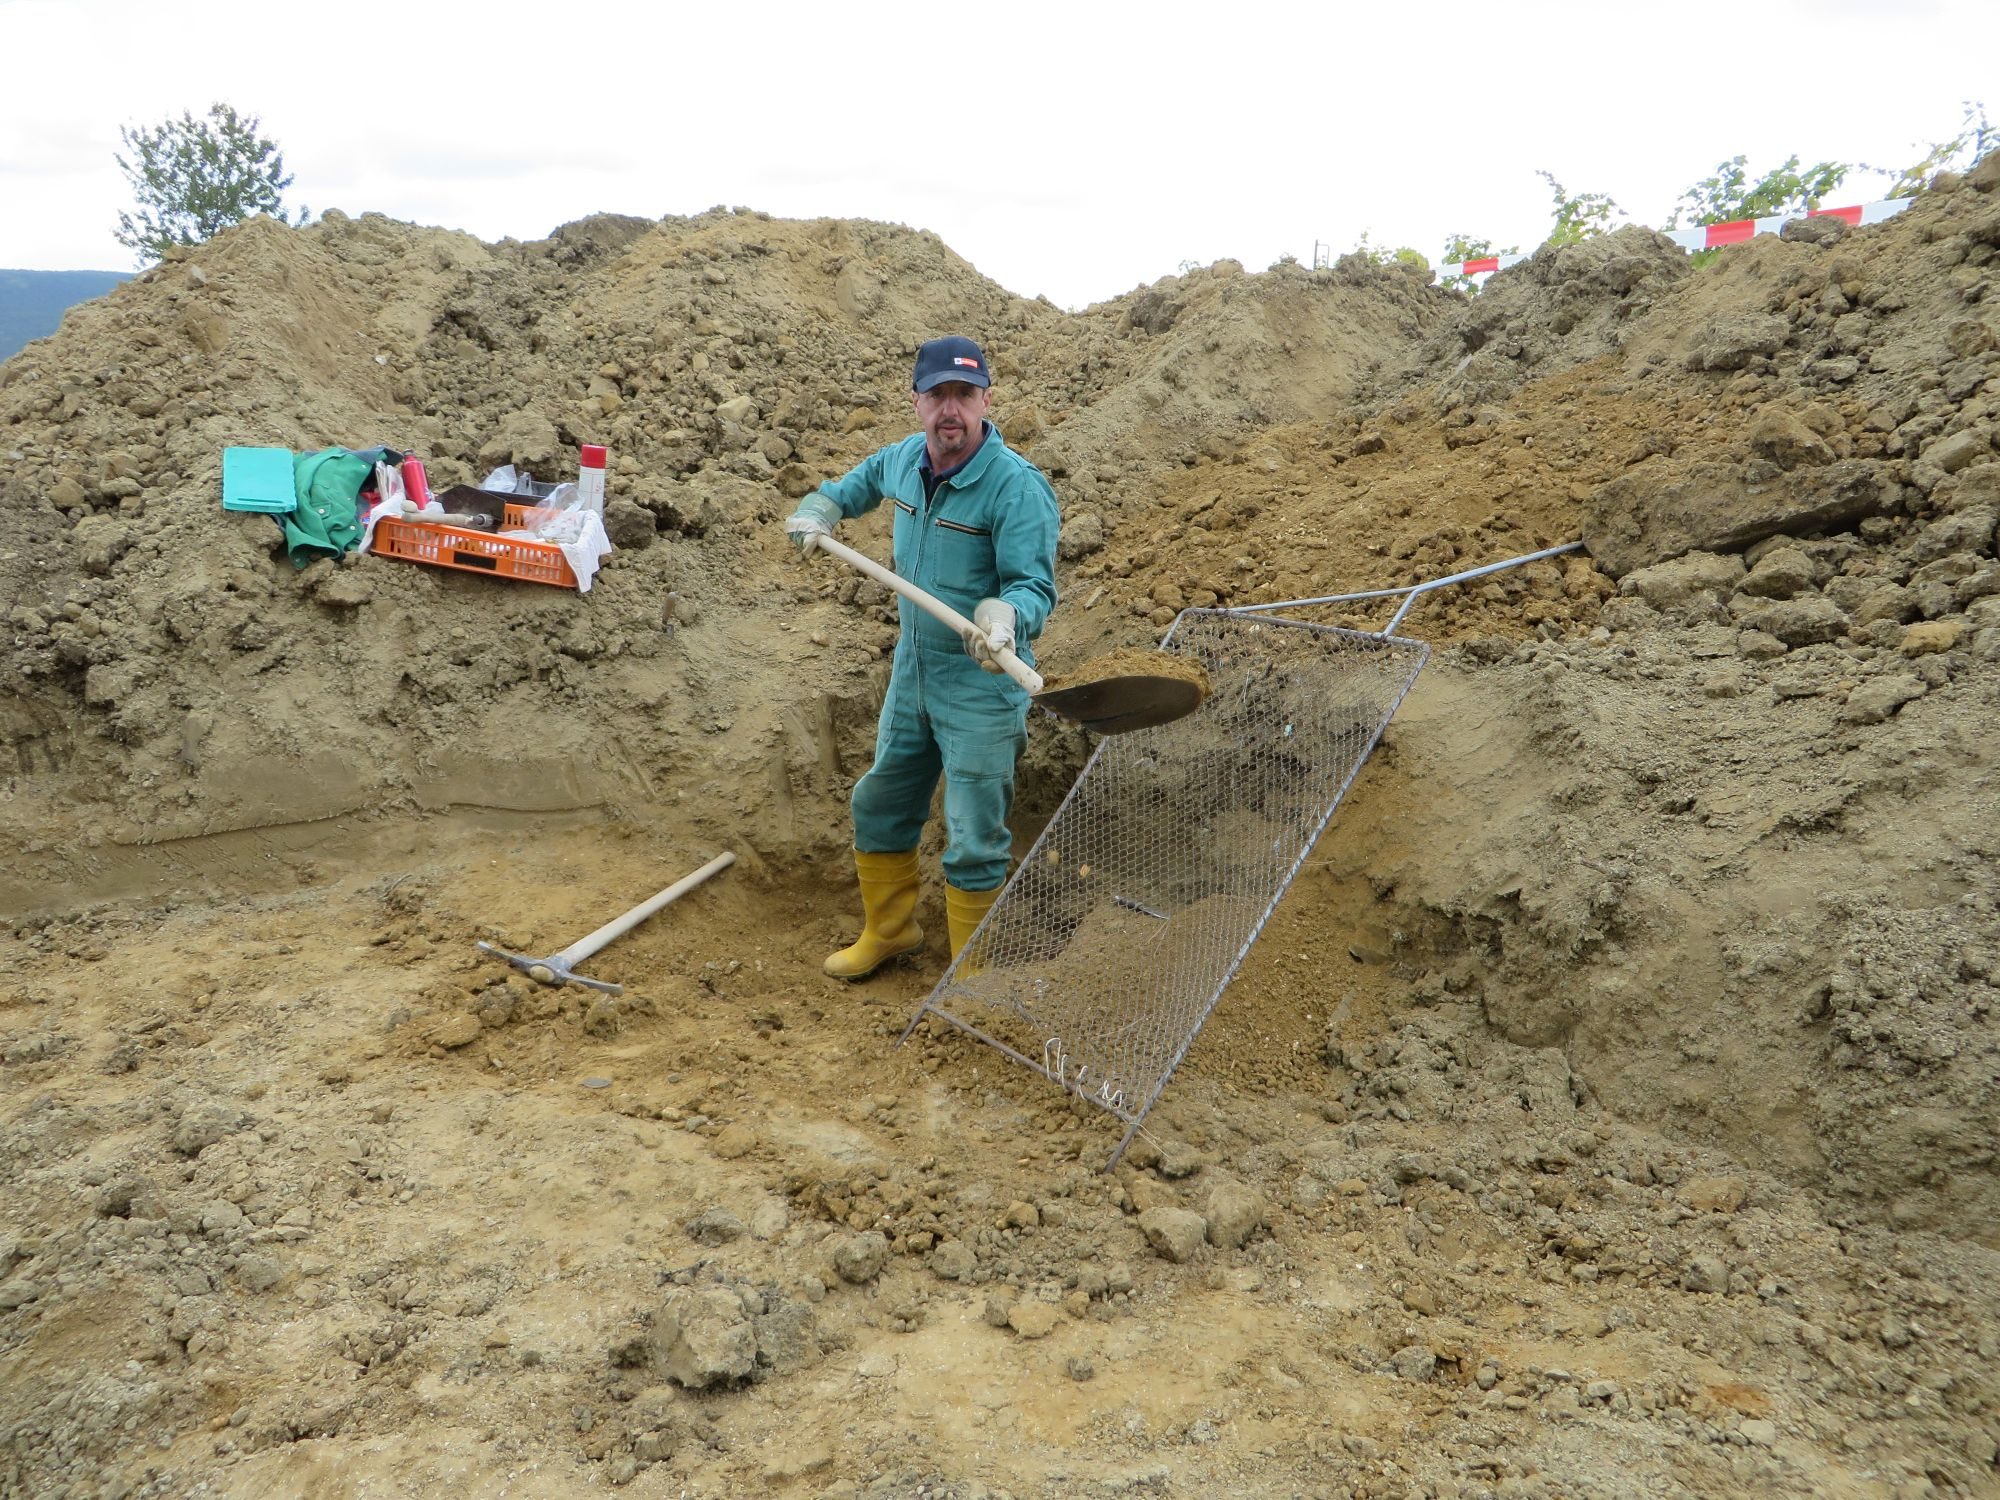 Grabung Gainfarn 2019, Grabungsbeginn (c) Gerhard Wanzenböck